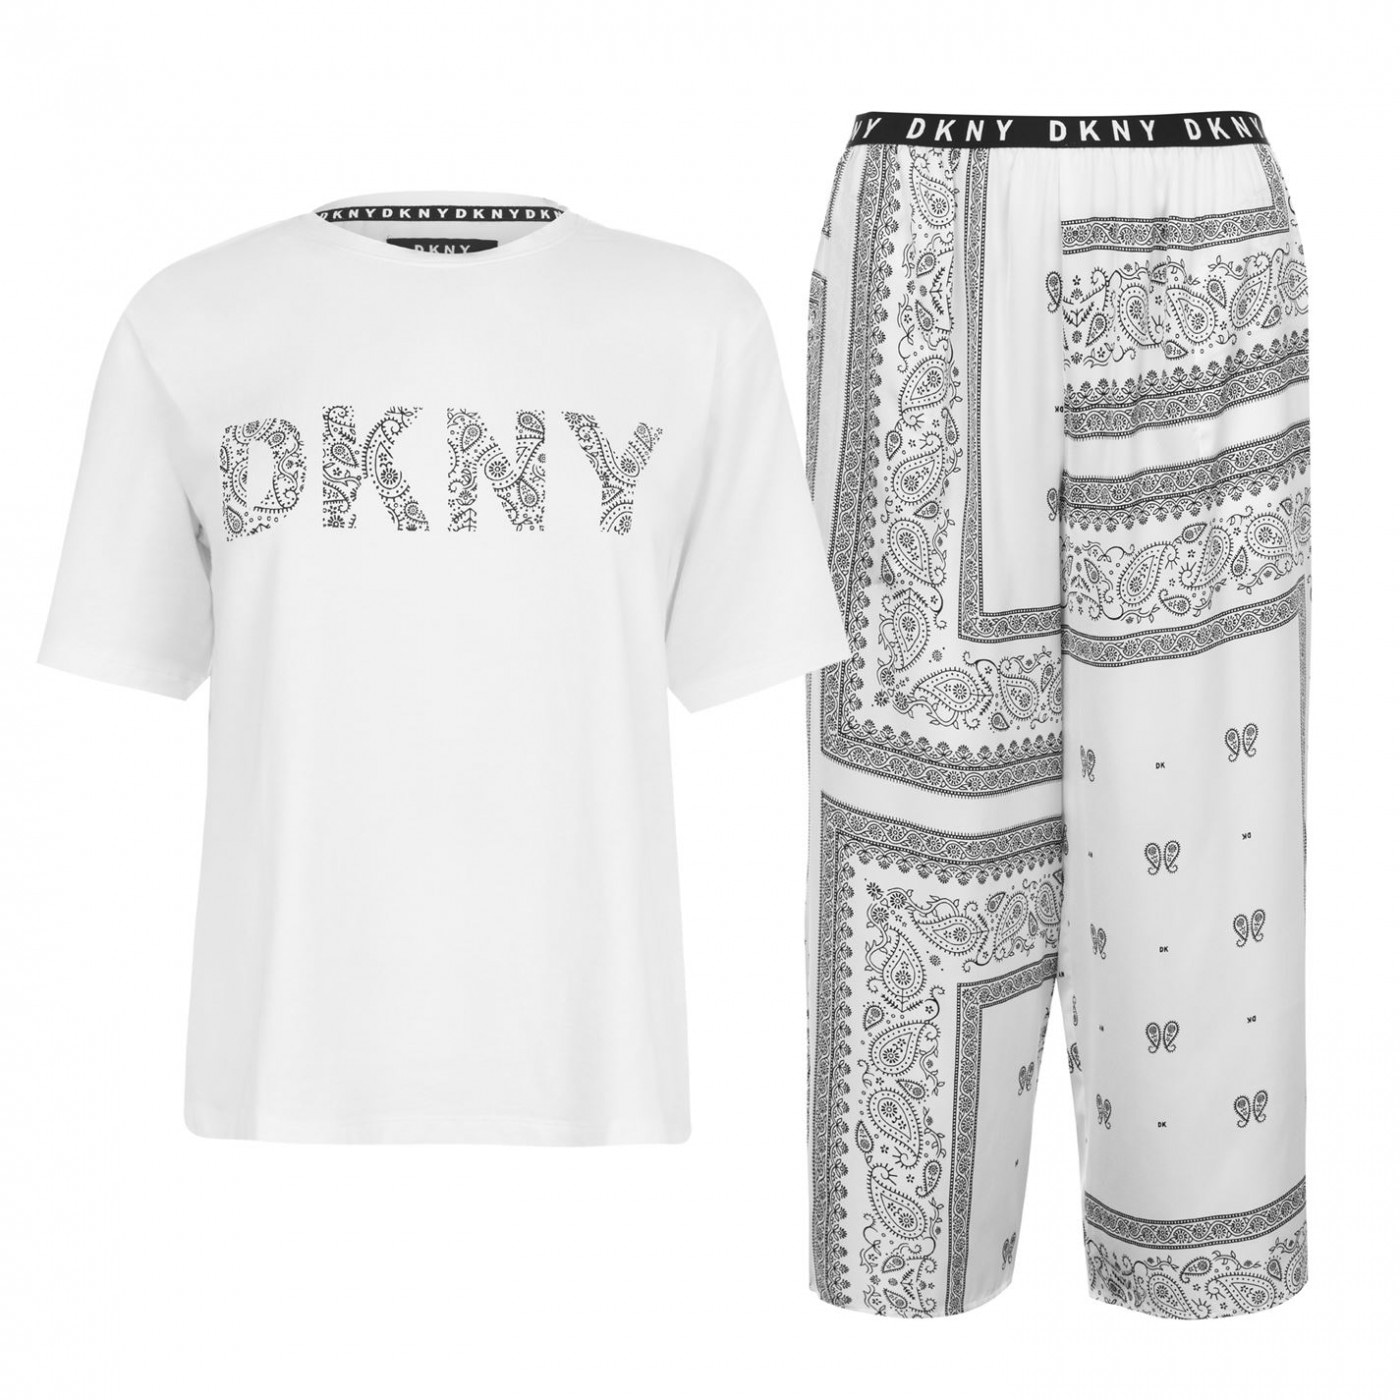 DKNY Top and Capri Pyjamas